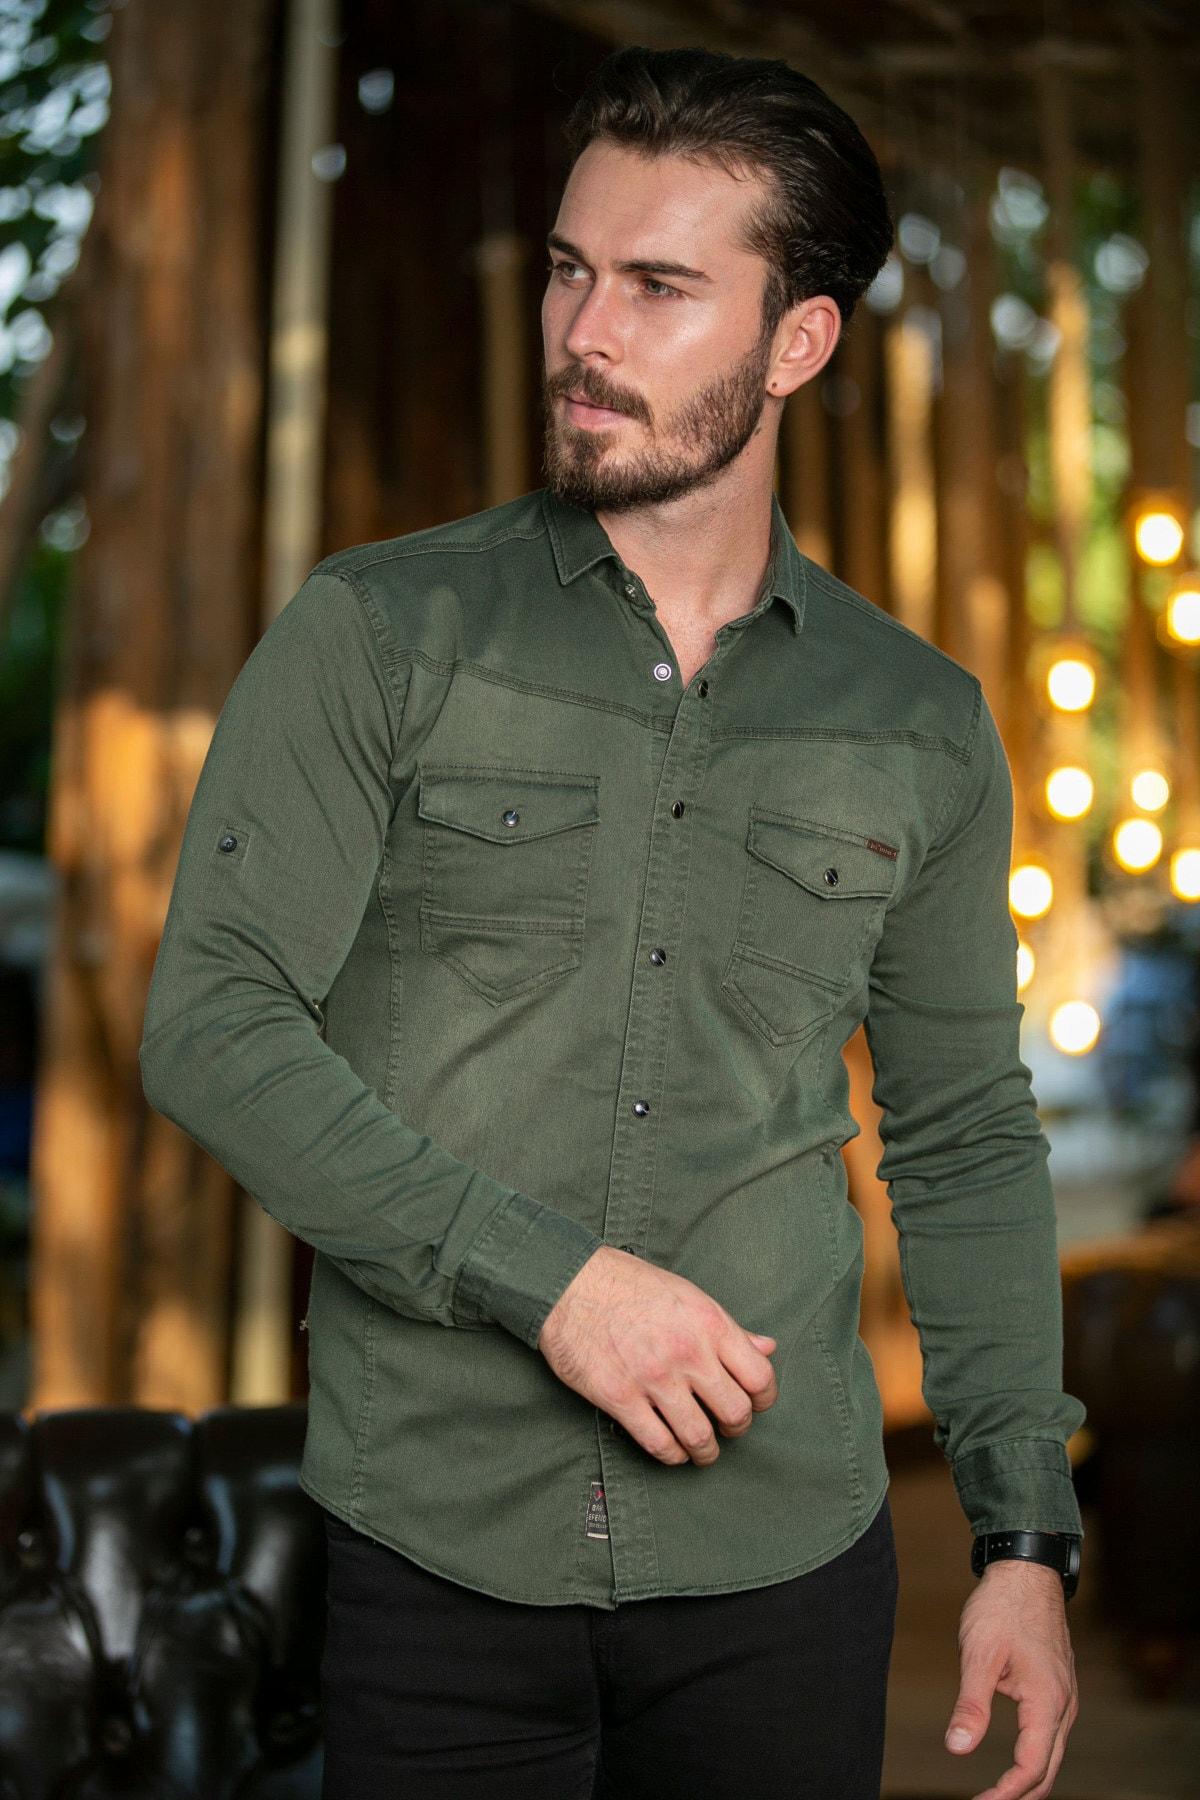 BAYEFENDİ Haki Cepli Kot Gömlek Slim Fit 2